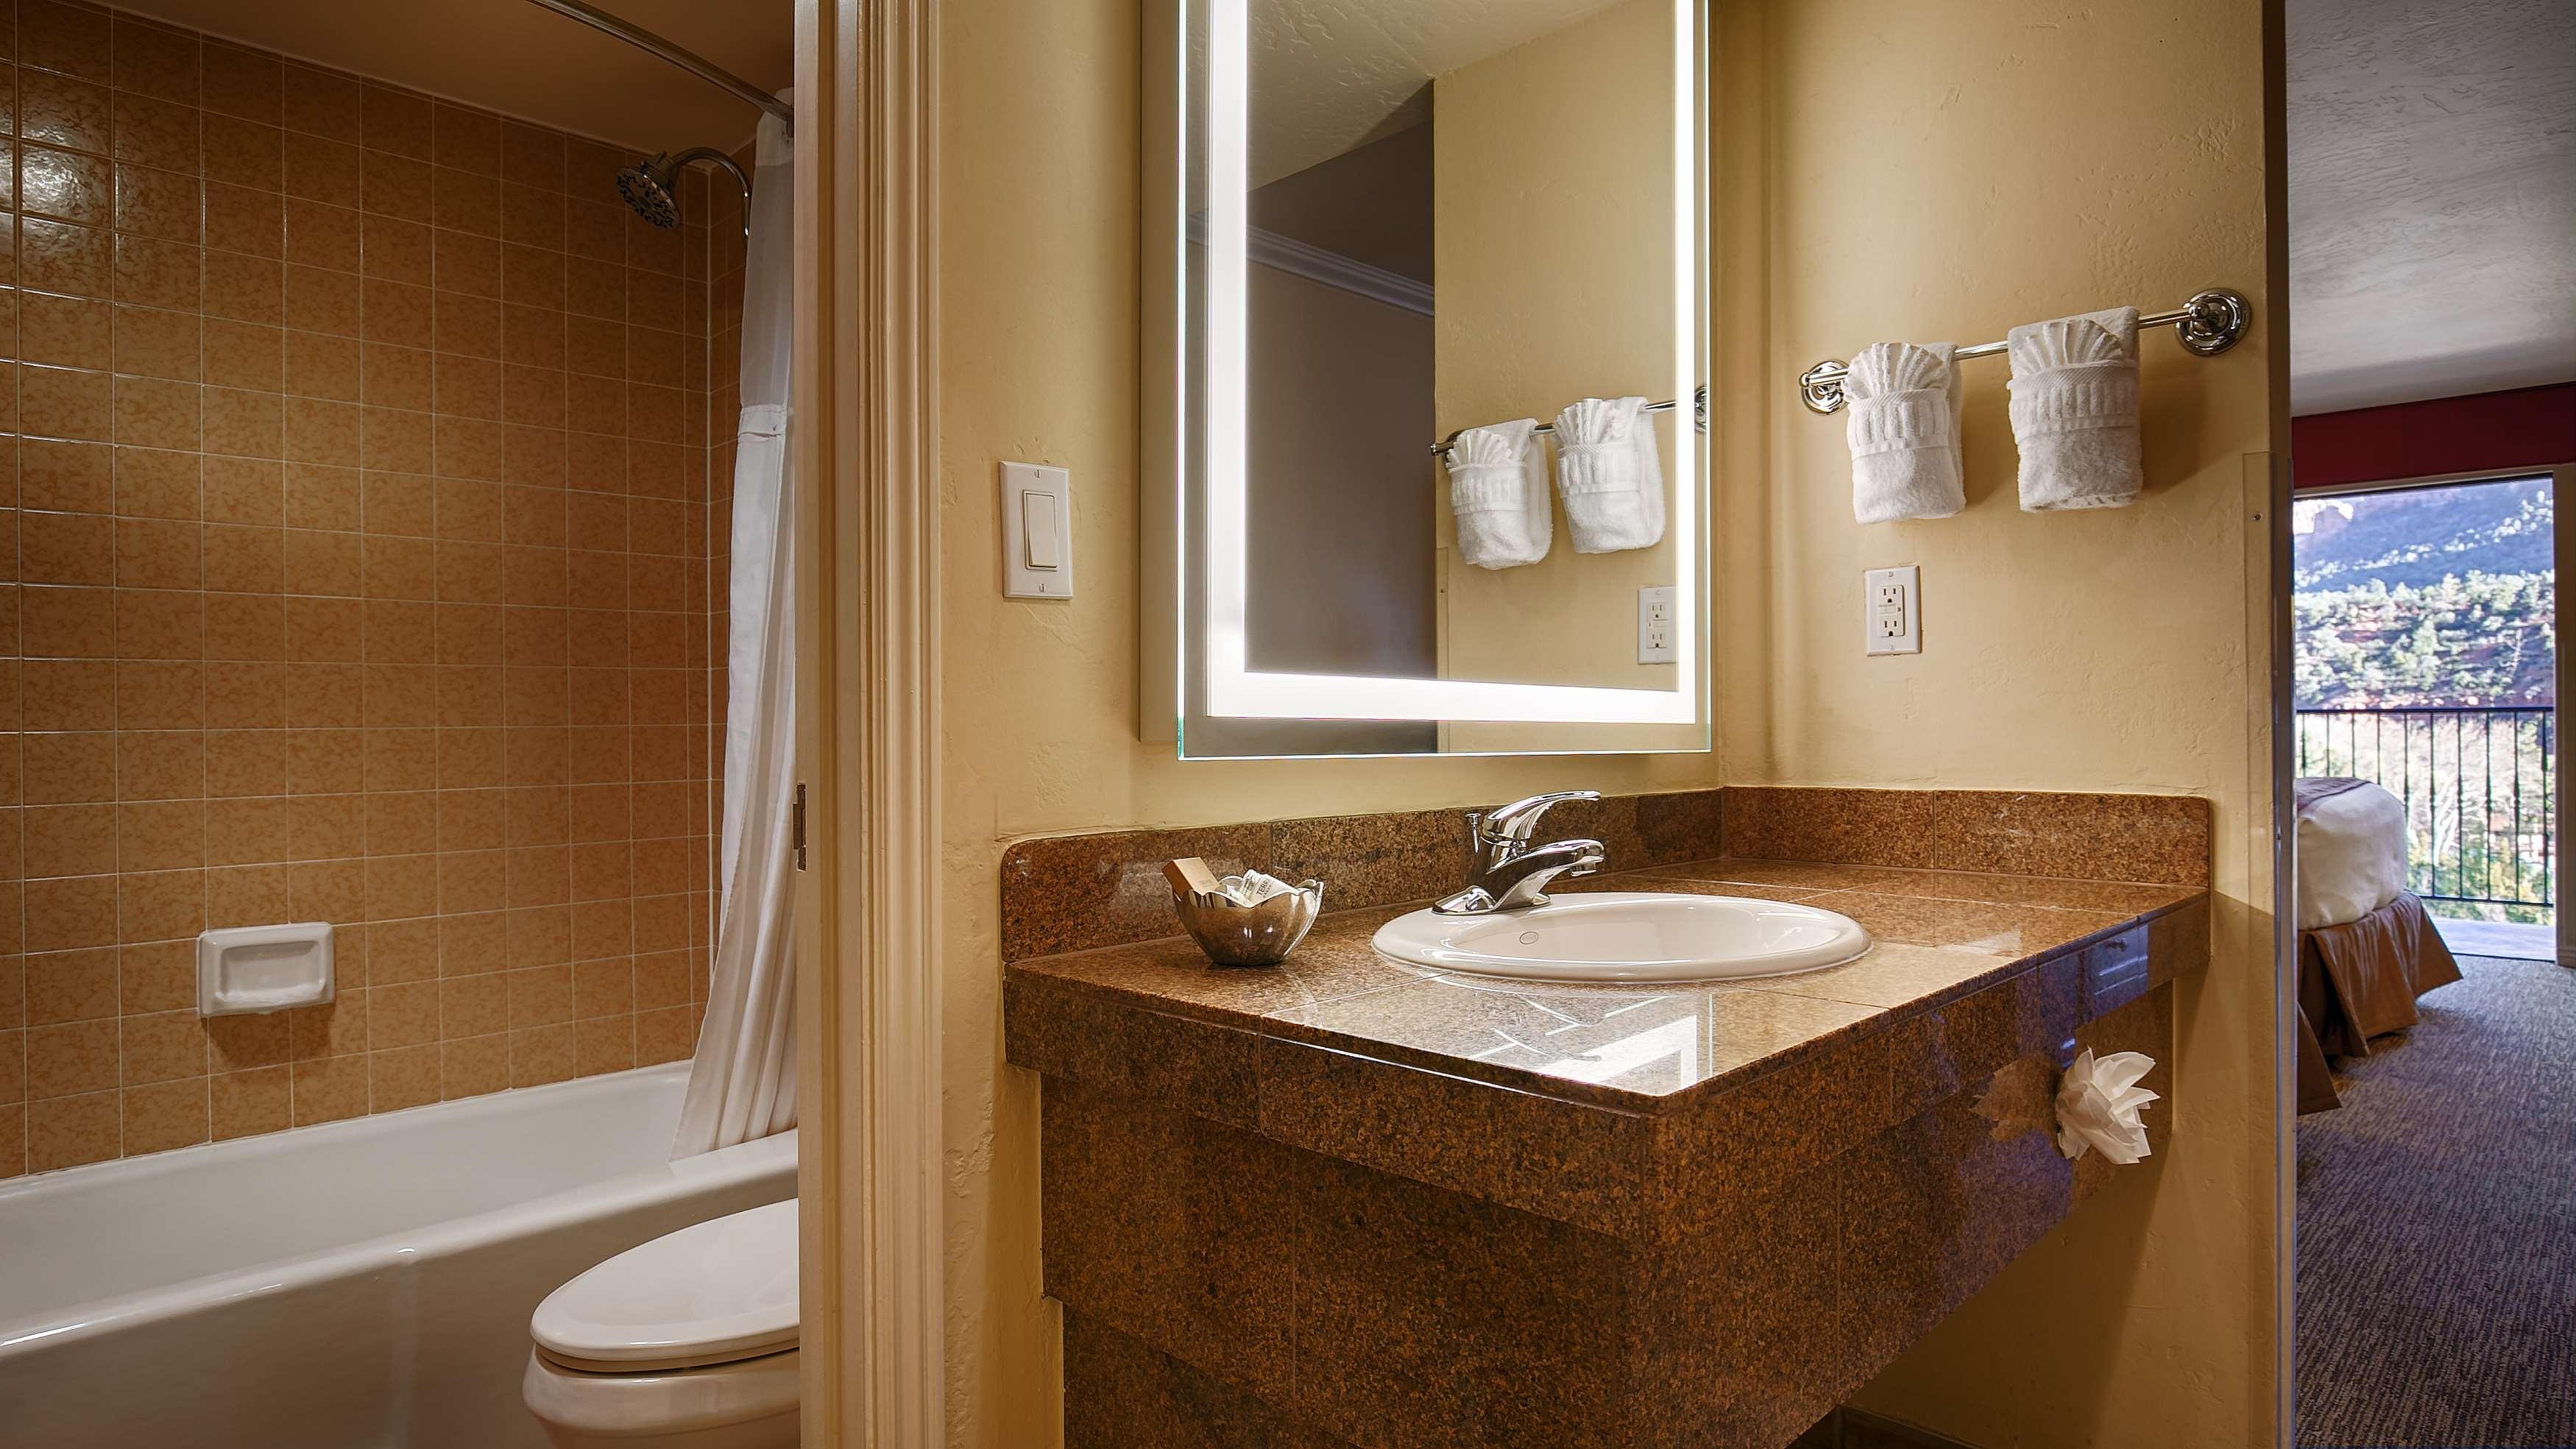 Best Western Plus Arroyo Roble Hotel & Creekside Villas image 48